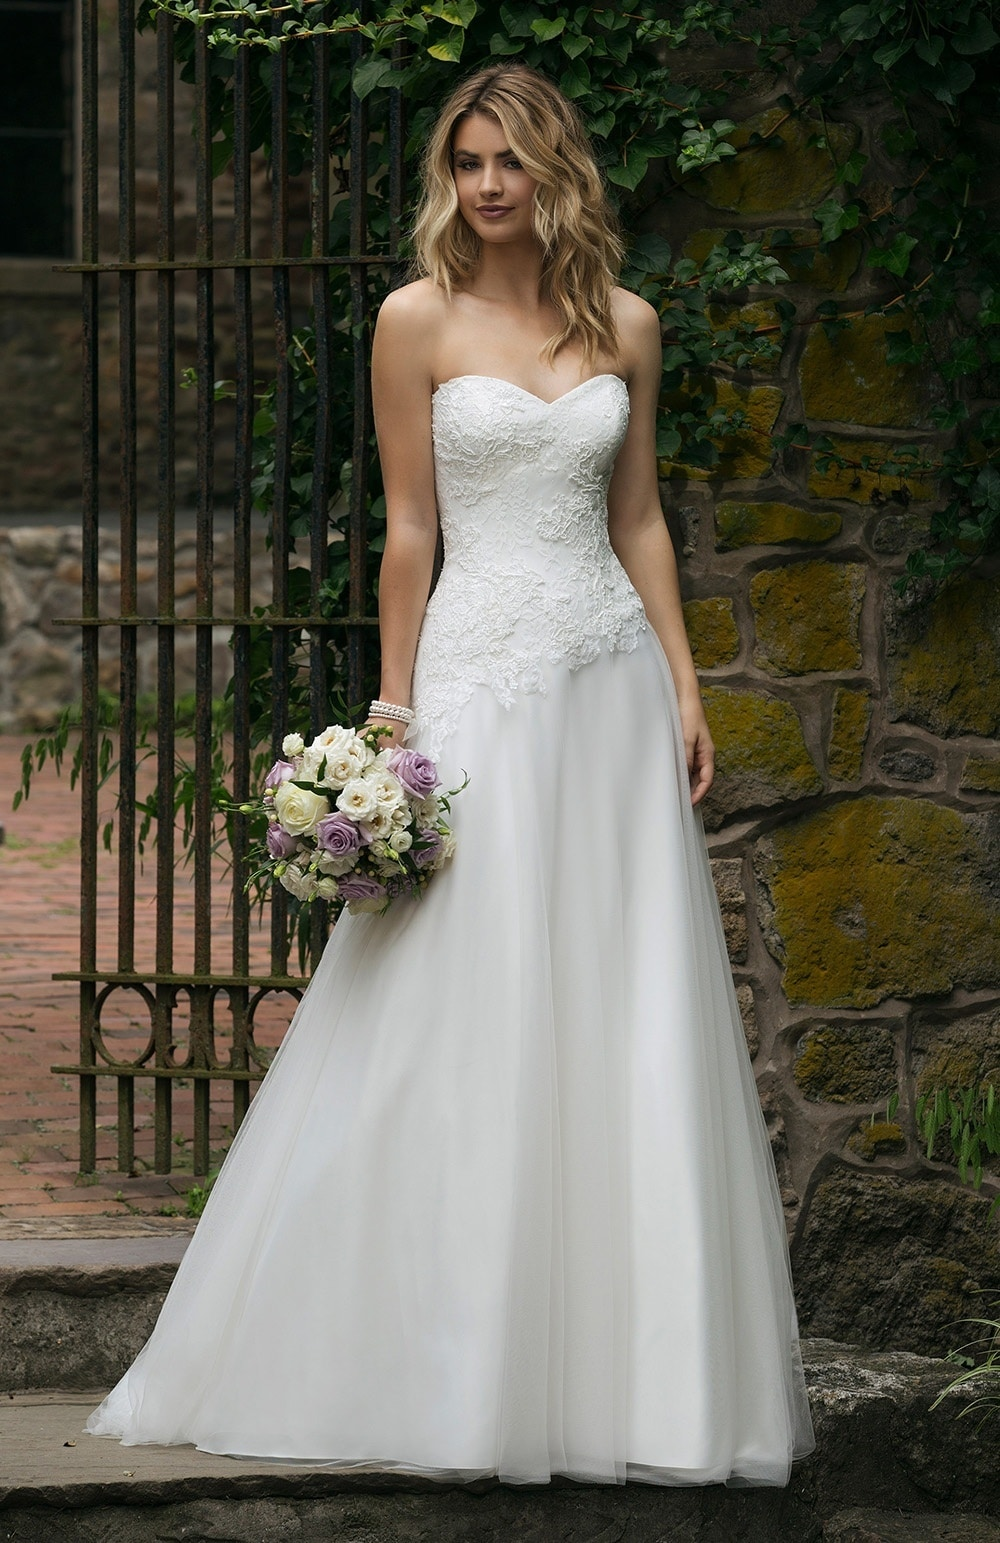 Robe de mariée Modèle 44046 – Sacha